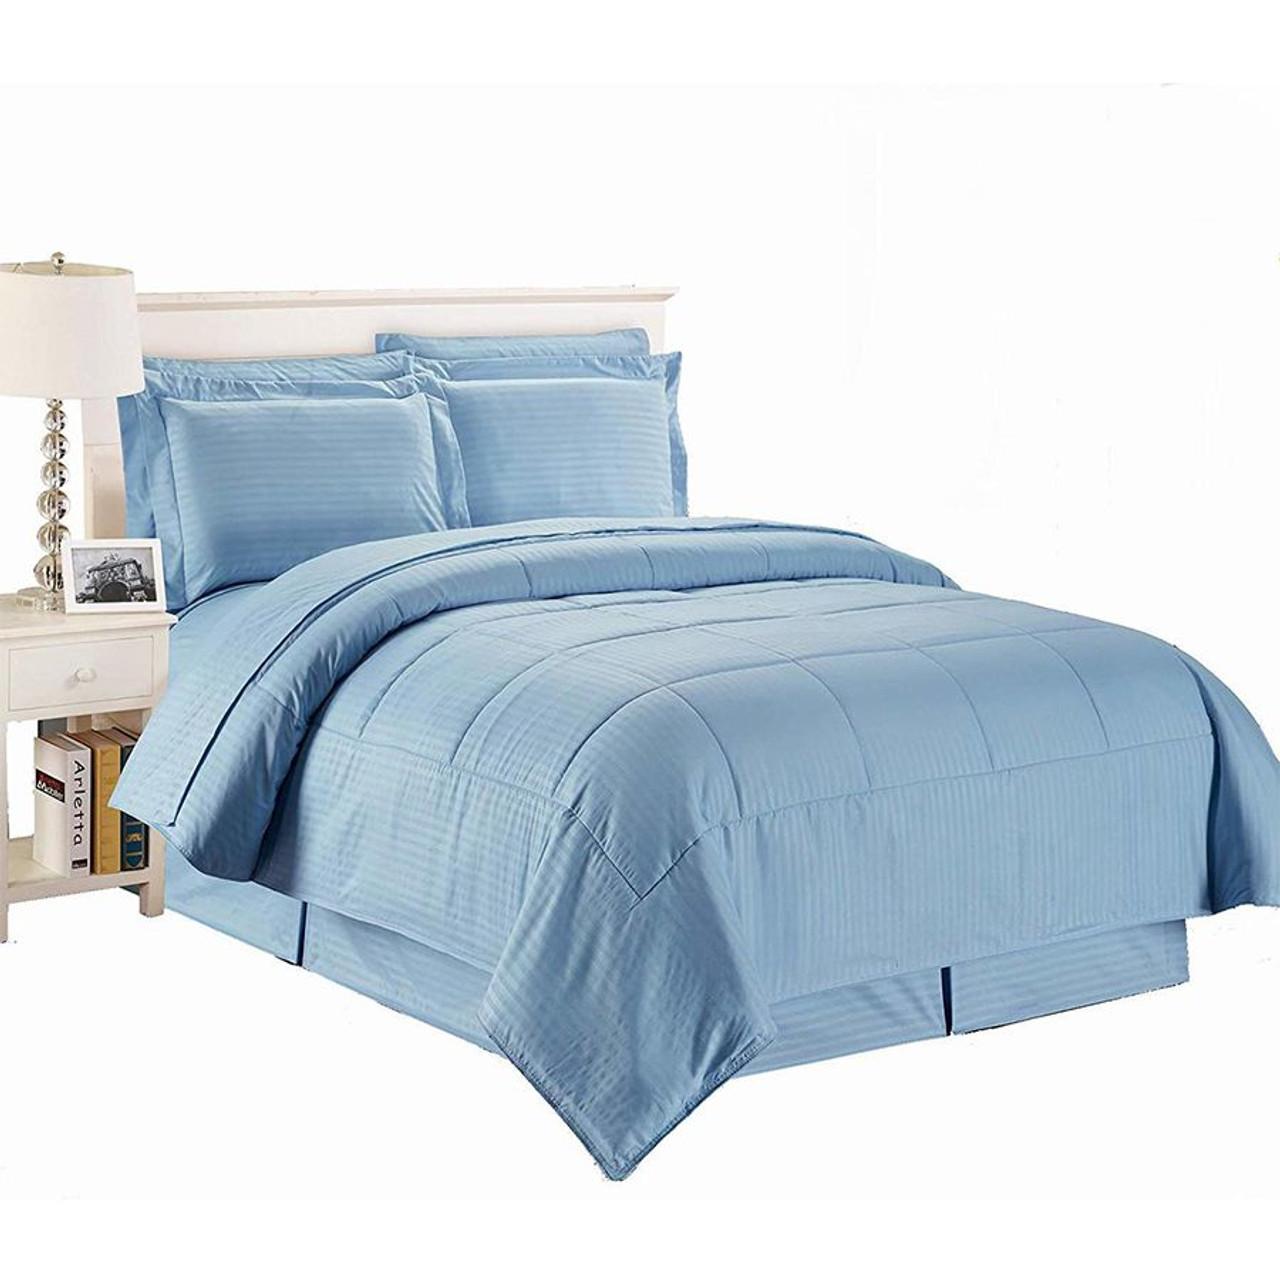 8 pc Microfiber Comforter Set Light Blue Color